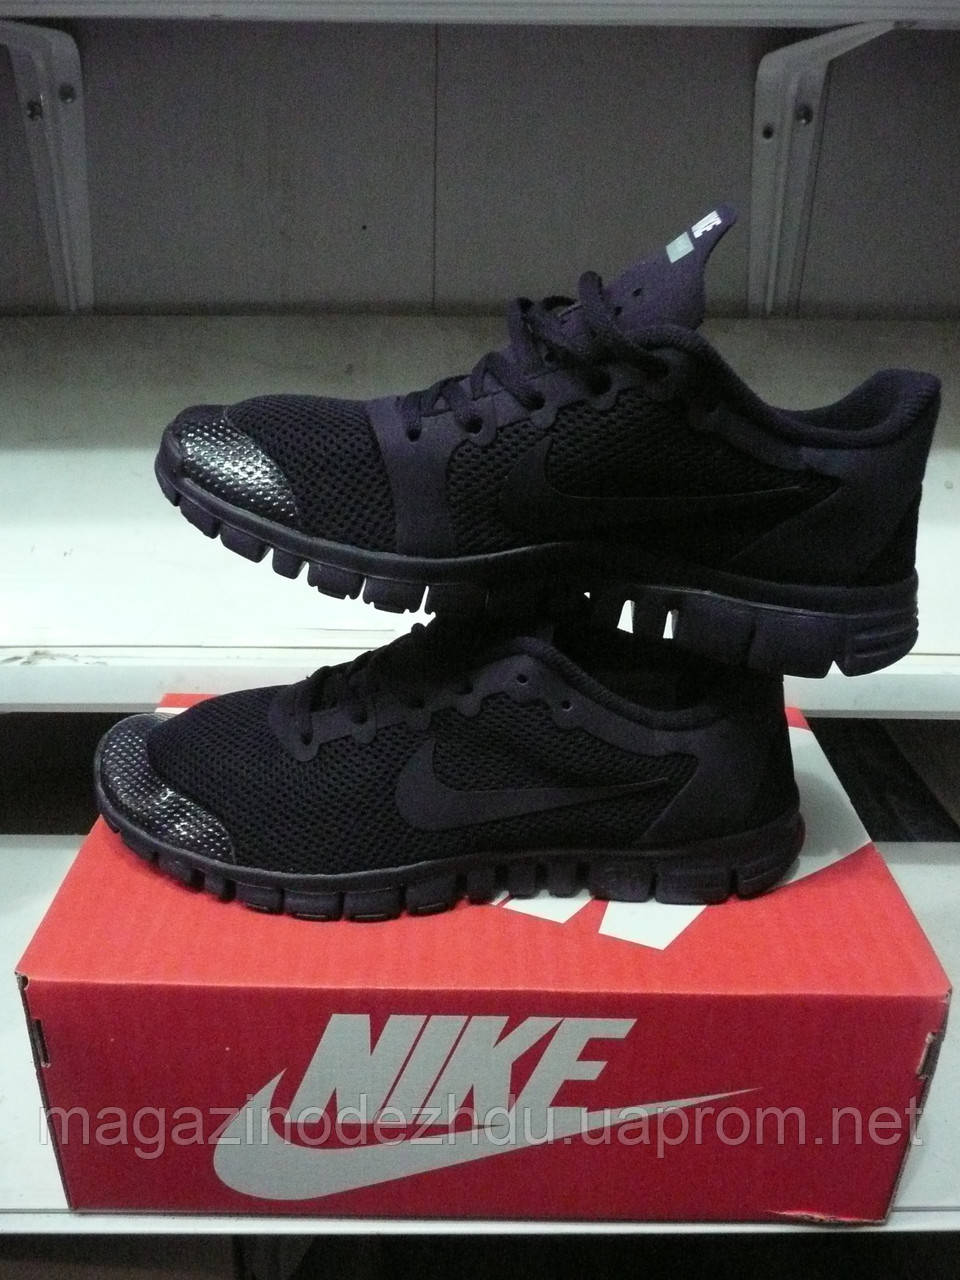 865eb103 Мужские кроссовки Nike free run 3.0, Харьков - Интернет магазин